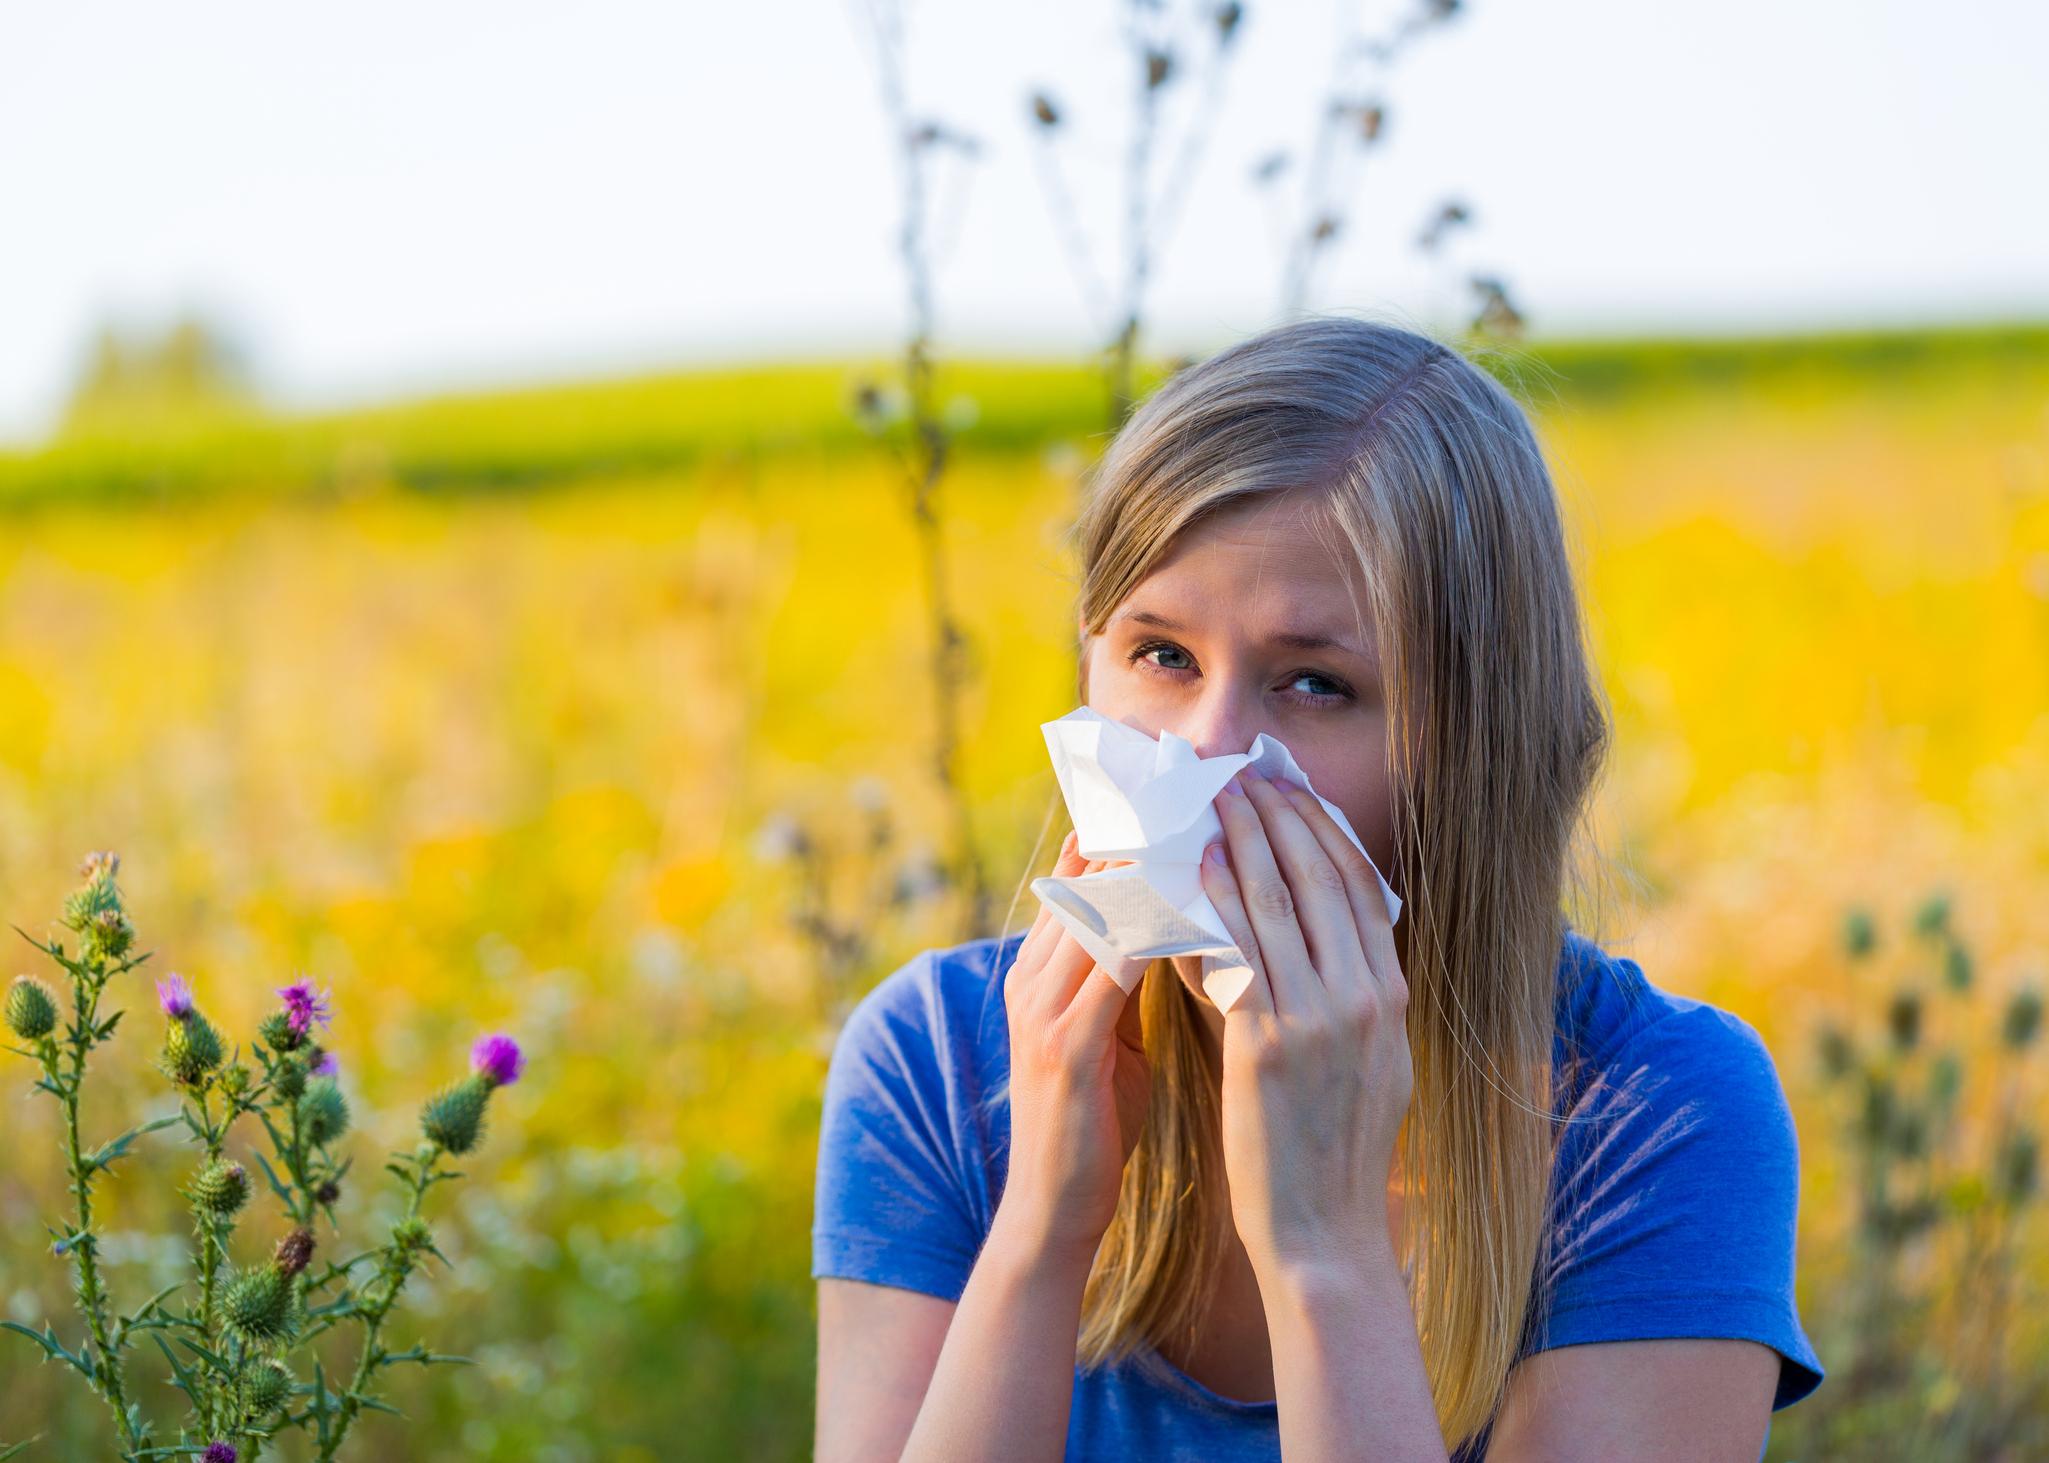 Allergic Woman Using Handkerchief On Runny Nose. AAOA, Allergy